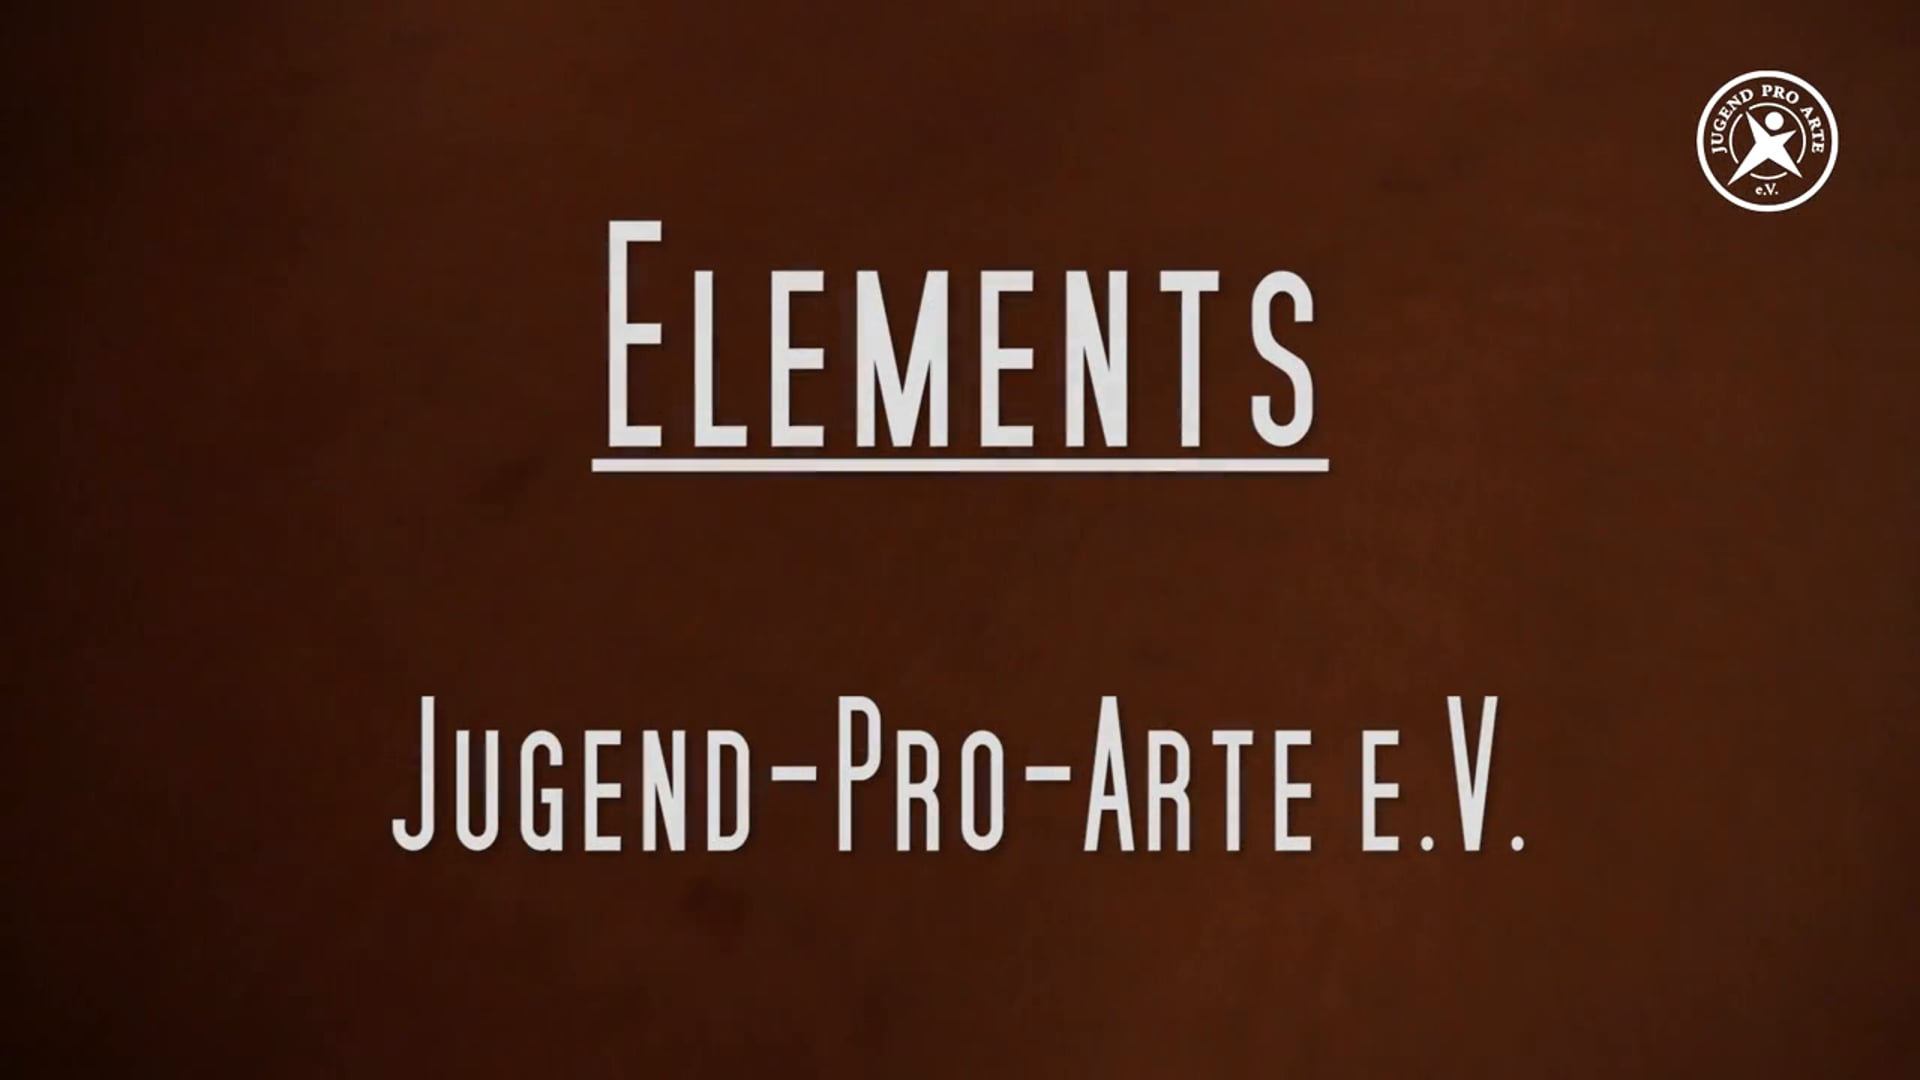 Trailer: ELEMENTS! - JugendProArte e.V.